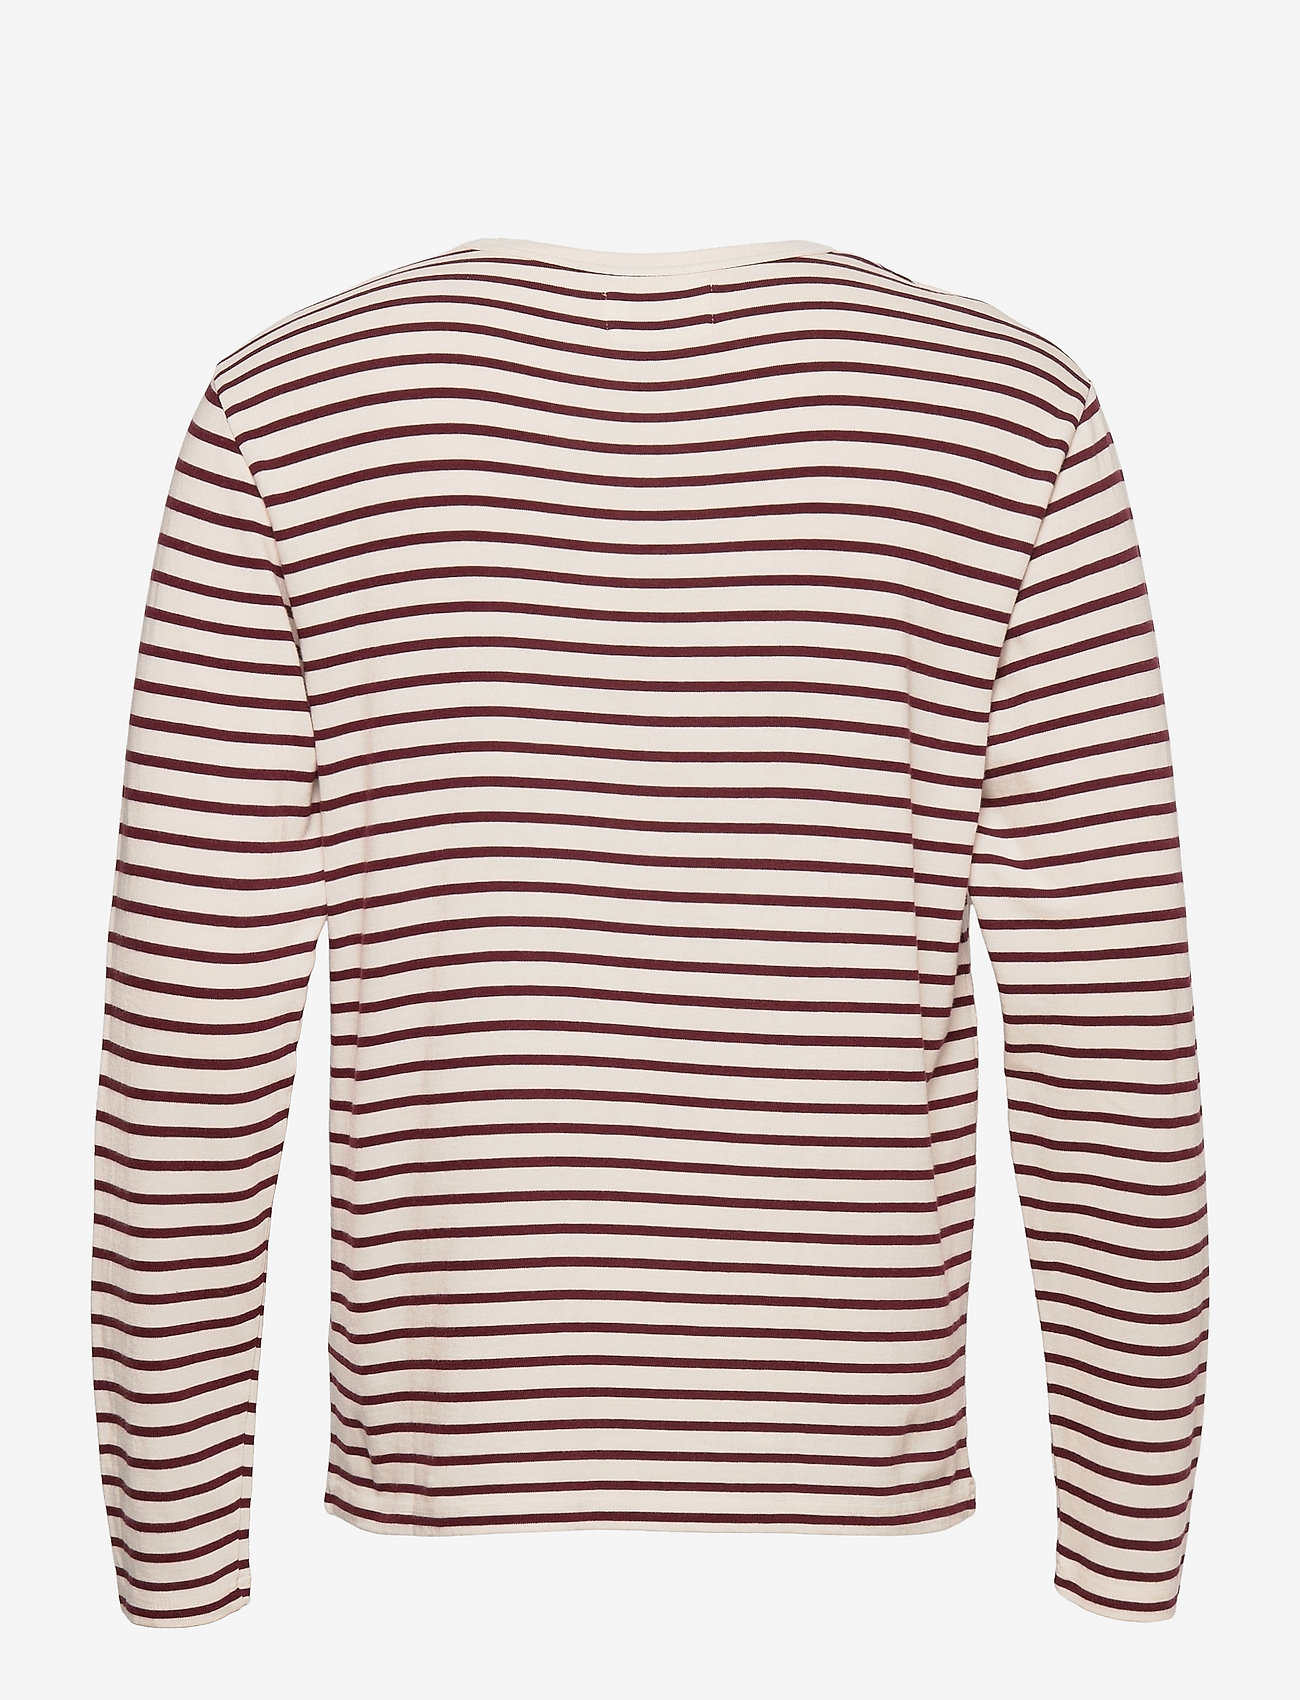 Wood Wood - Mel long sleeve - lange mouwen - off-white/dark red stripes - 1